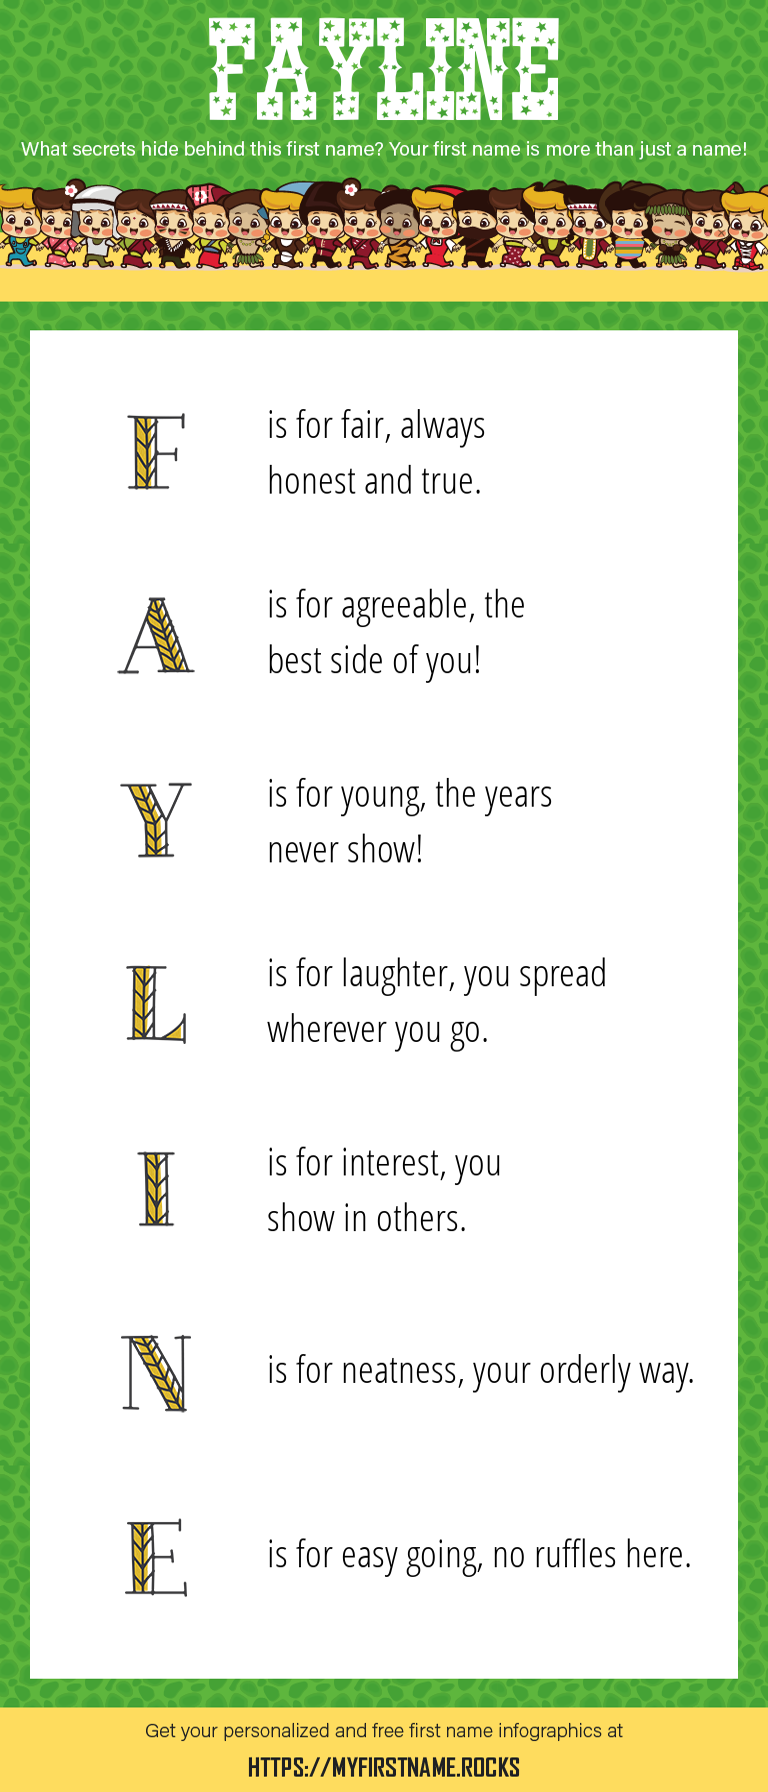 Fayline Infographics